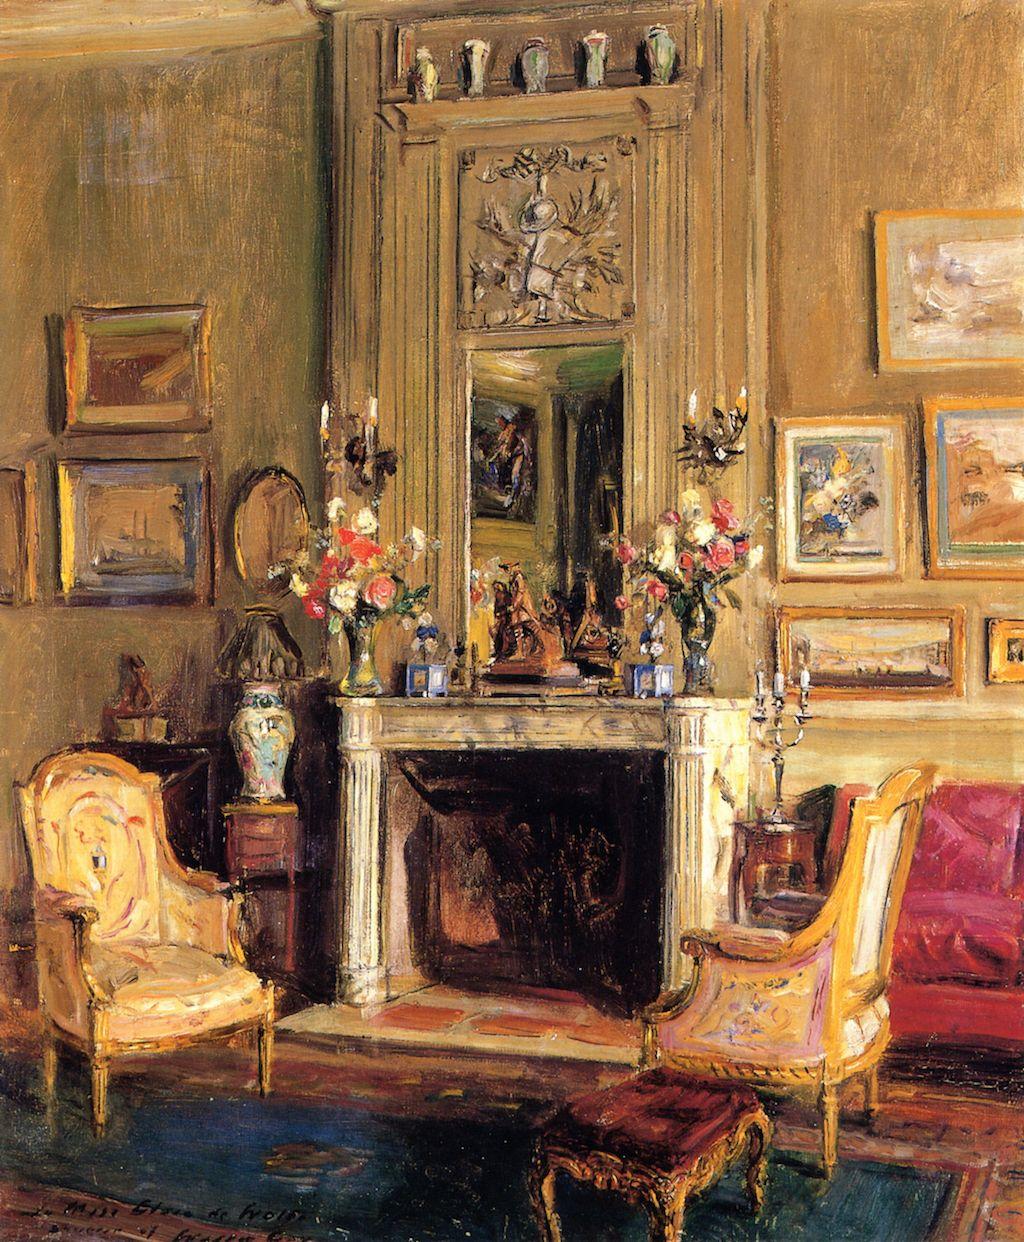 Elsie de Wolfe's Drawing Room, 123 East Fifth-fifth Street, New York / Walter Gay